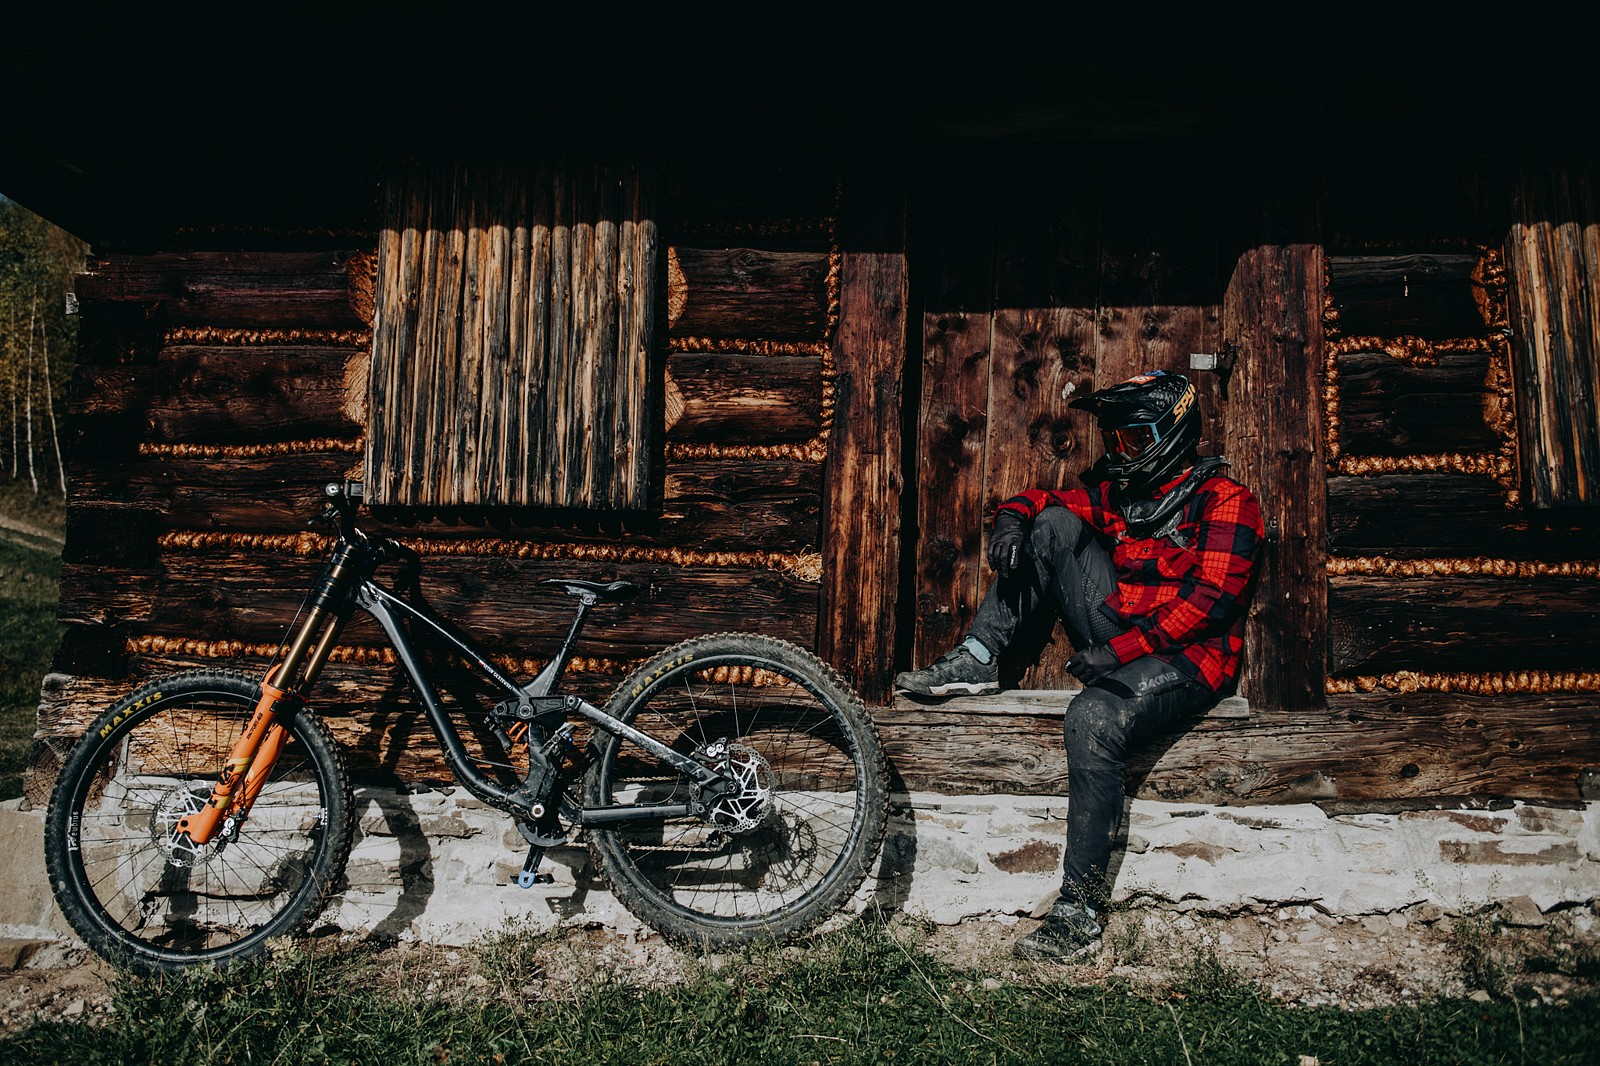 02DAB1D7-B04D-412A-9EFE-157BDBA2085D - Arczii95 - Mountain Biking Pictures - Vital MTB